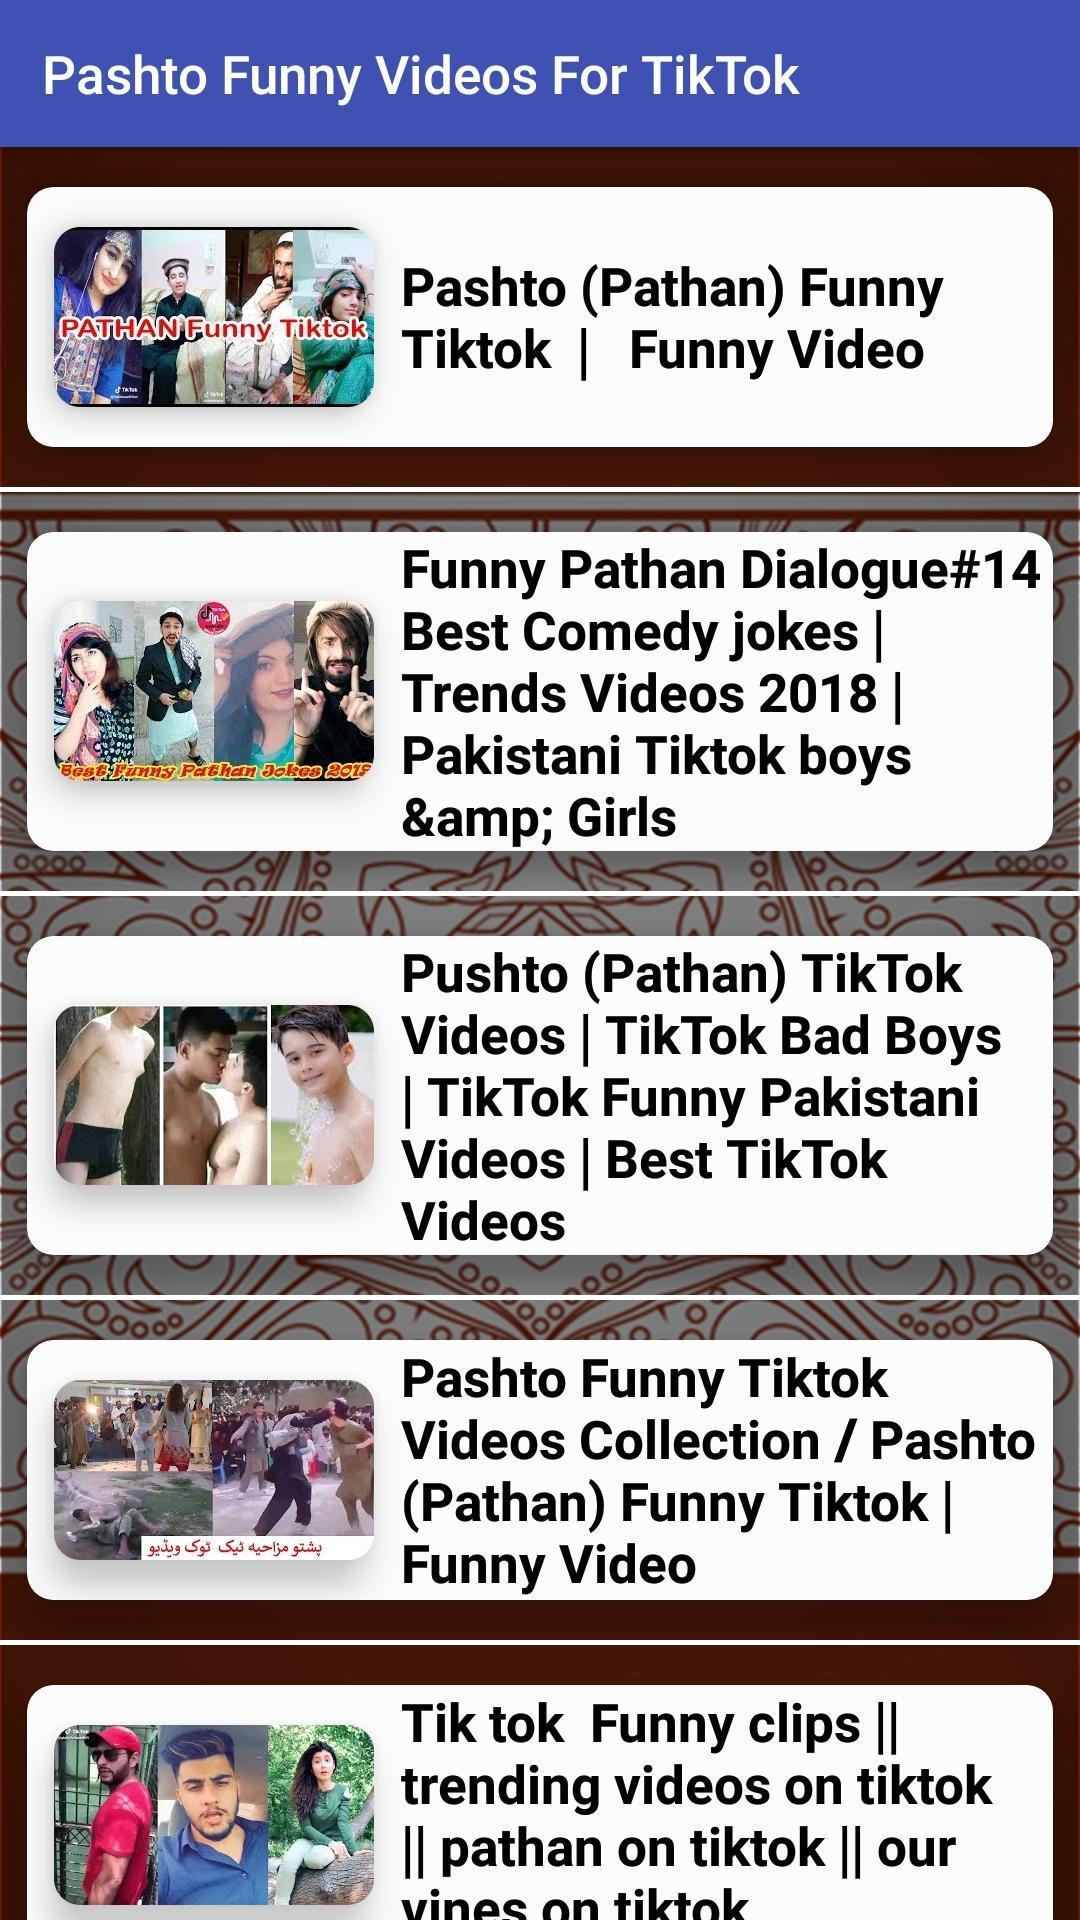 Pashto Funny Videos For Tik Tok For Android Apk Download